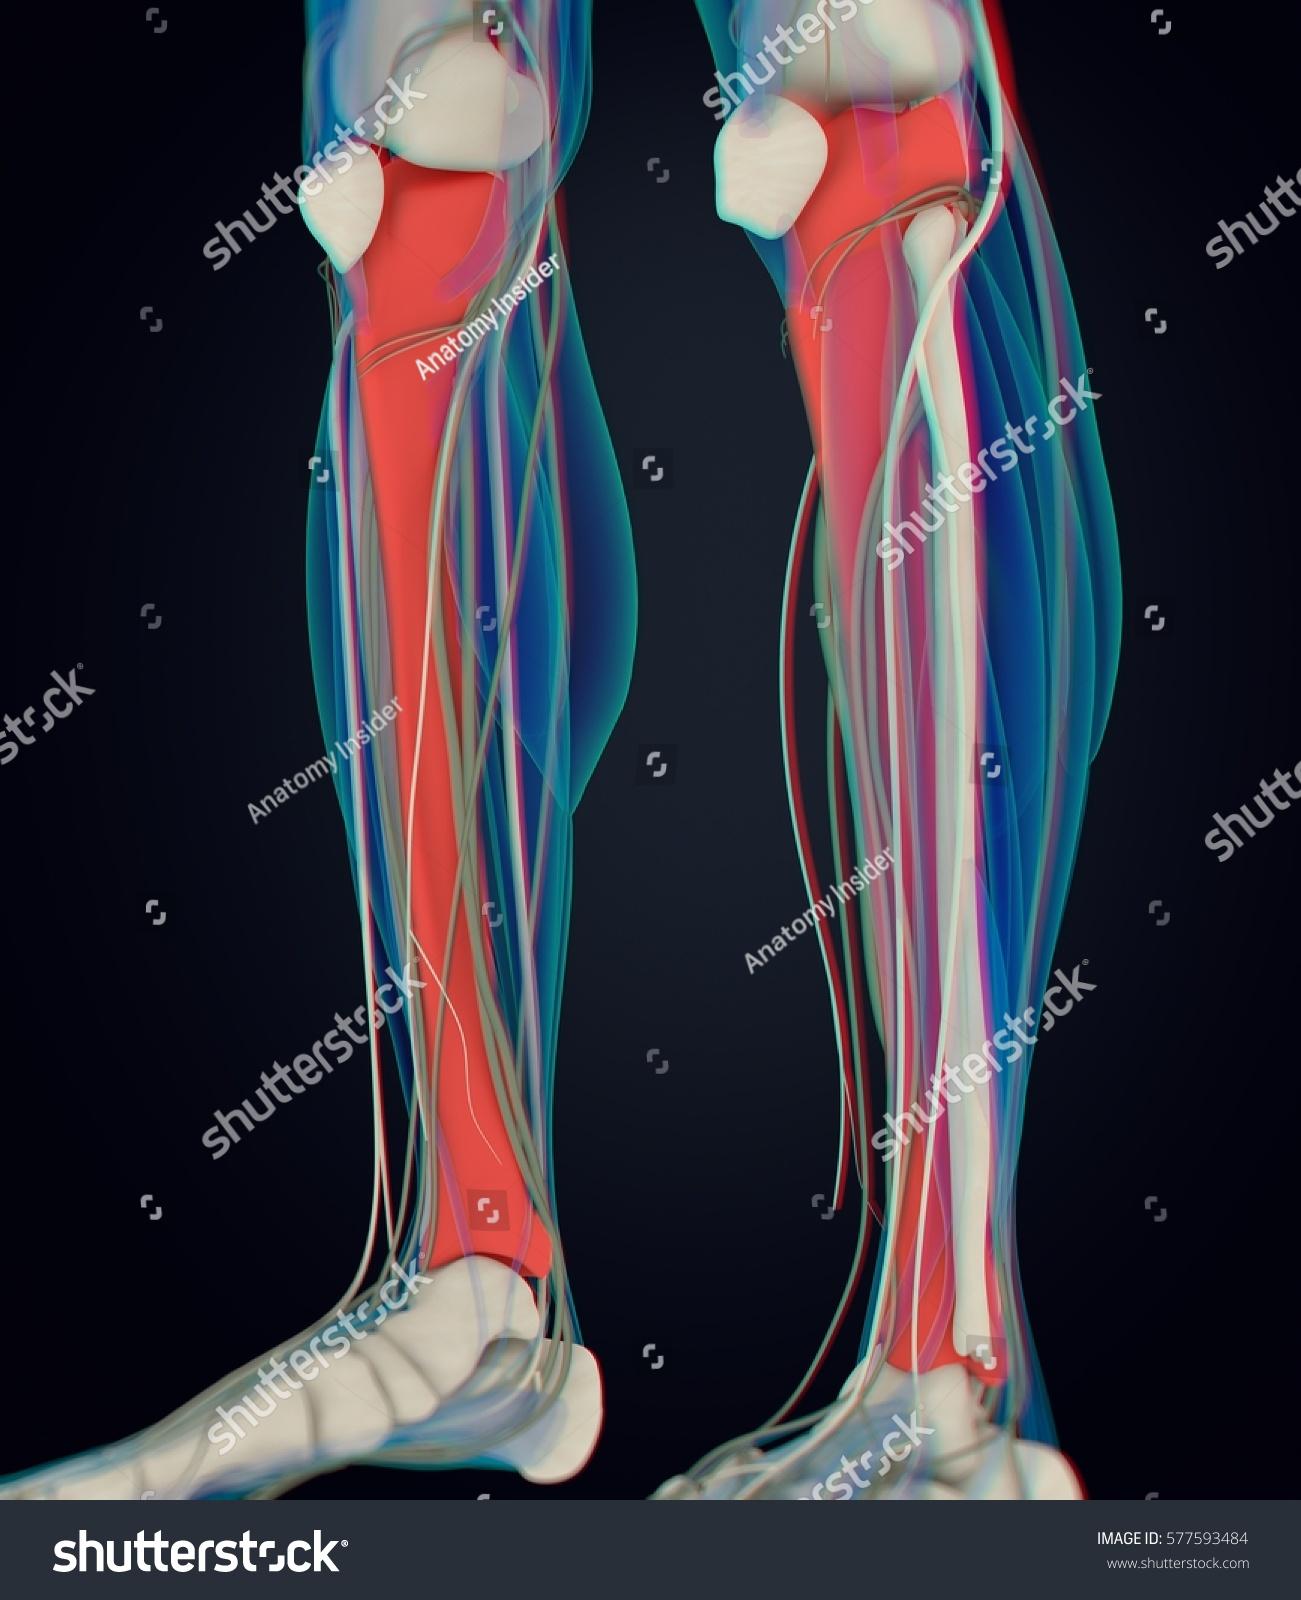 Royalty Free Stock Illustration Of Human Anatomy Male Tibia Shin